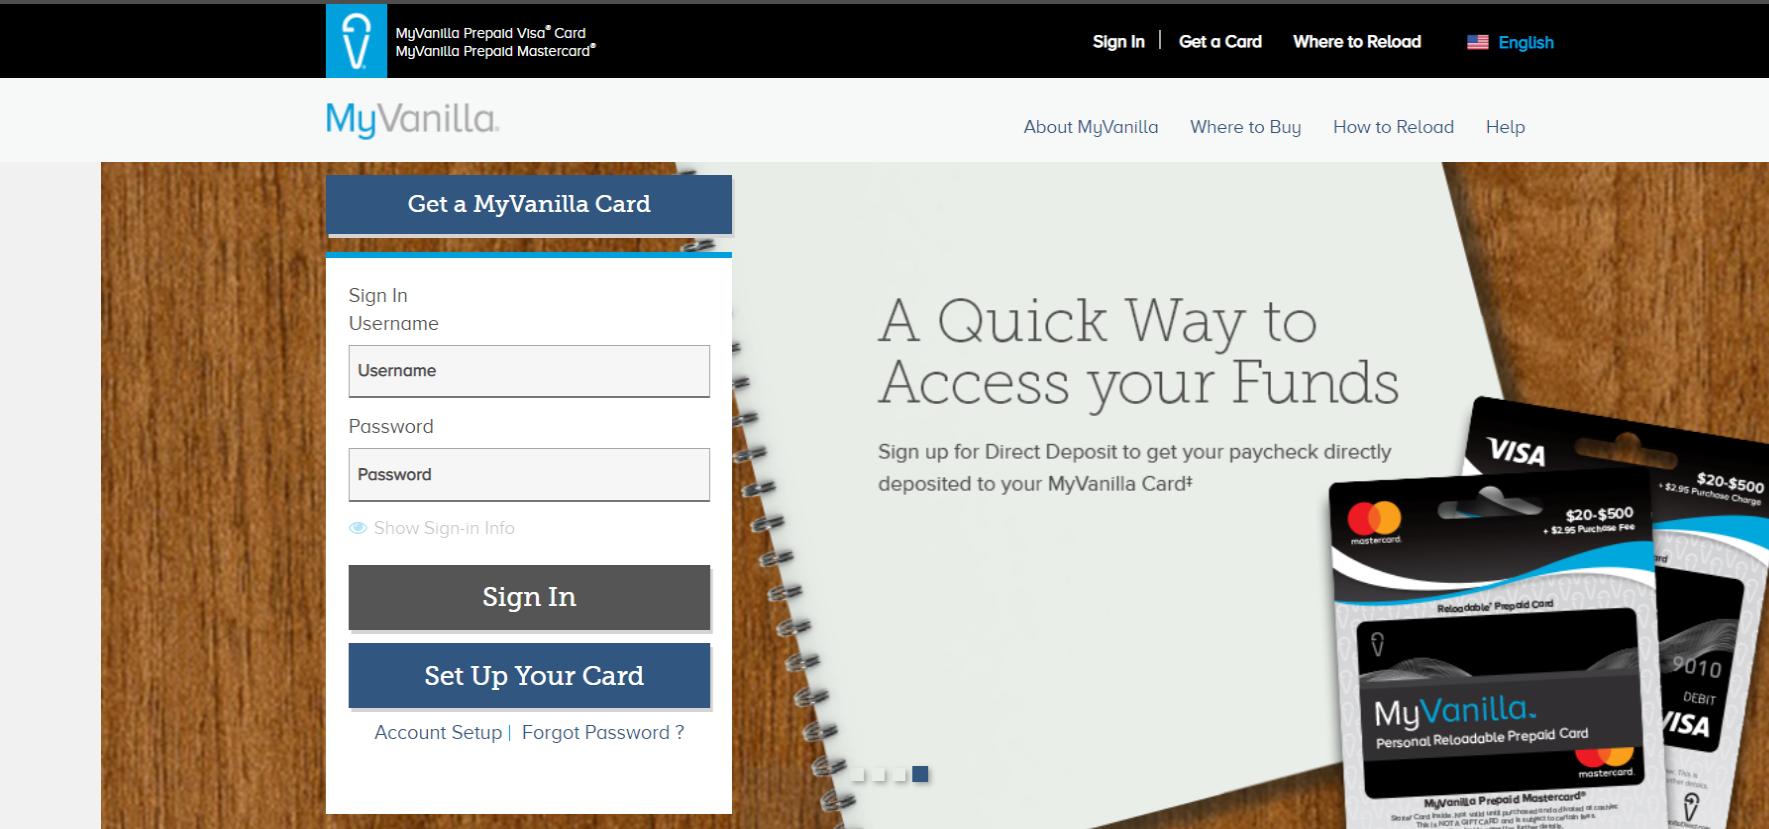 www.myvanillacard.com - My Vanilla Debit Card Login & Activation Guide